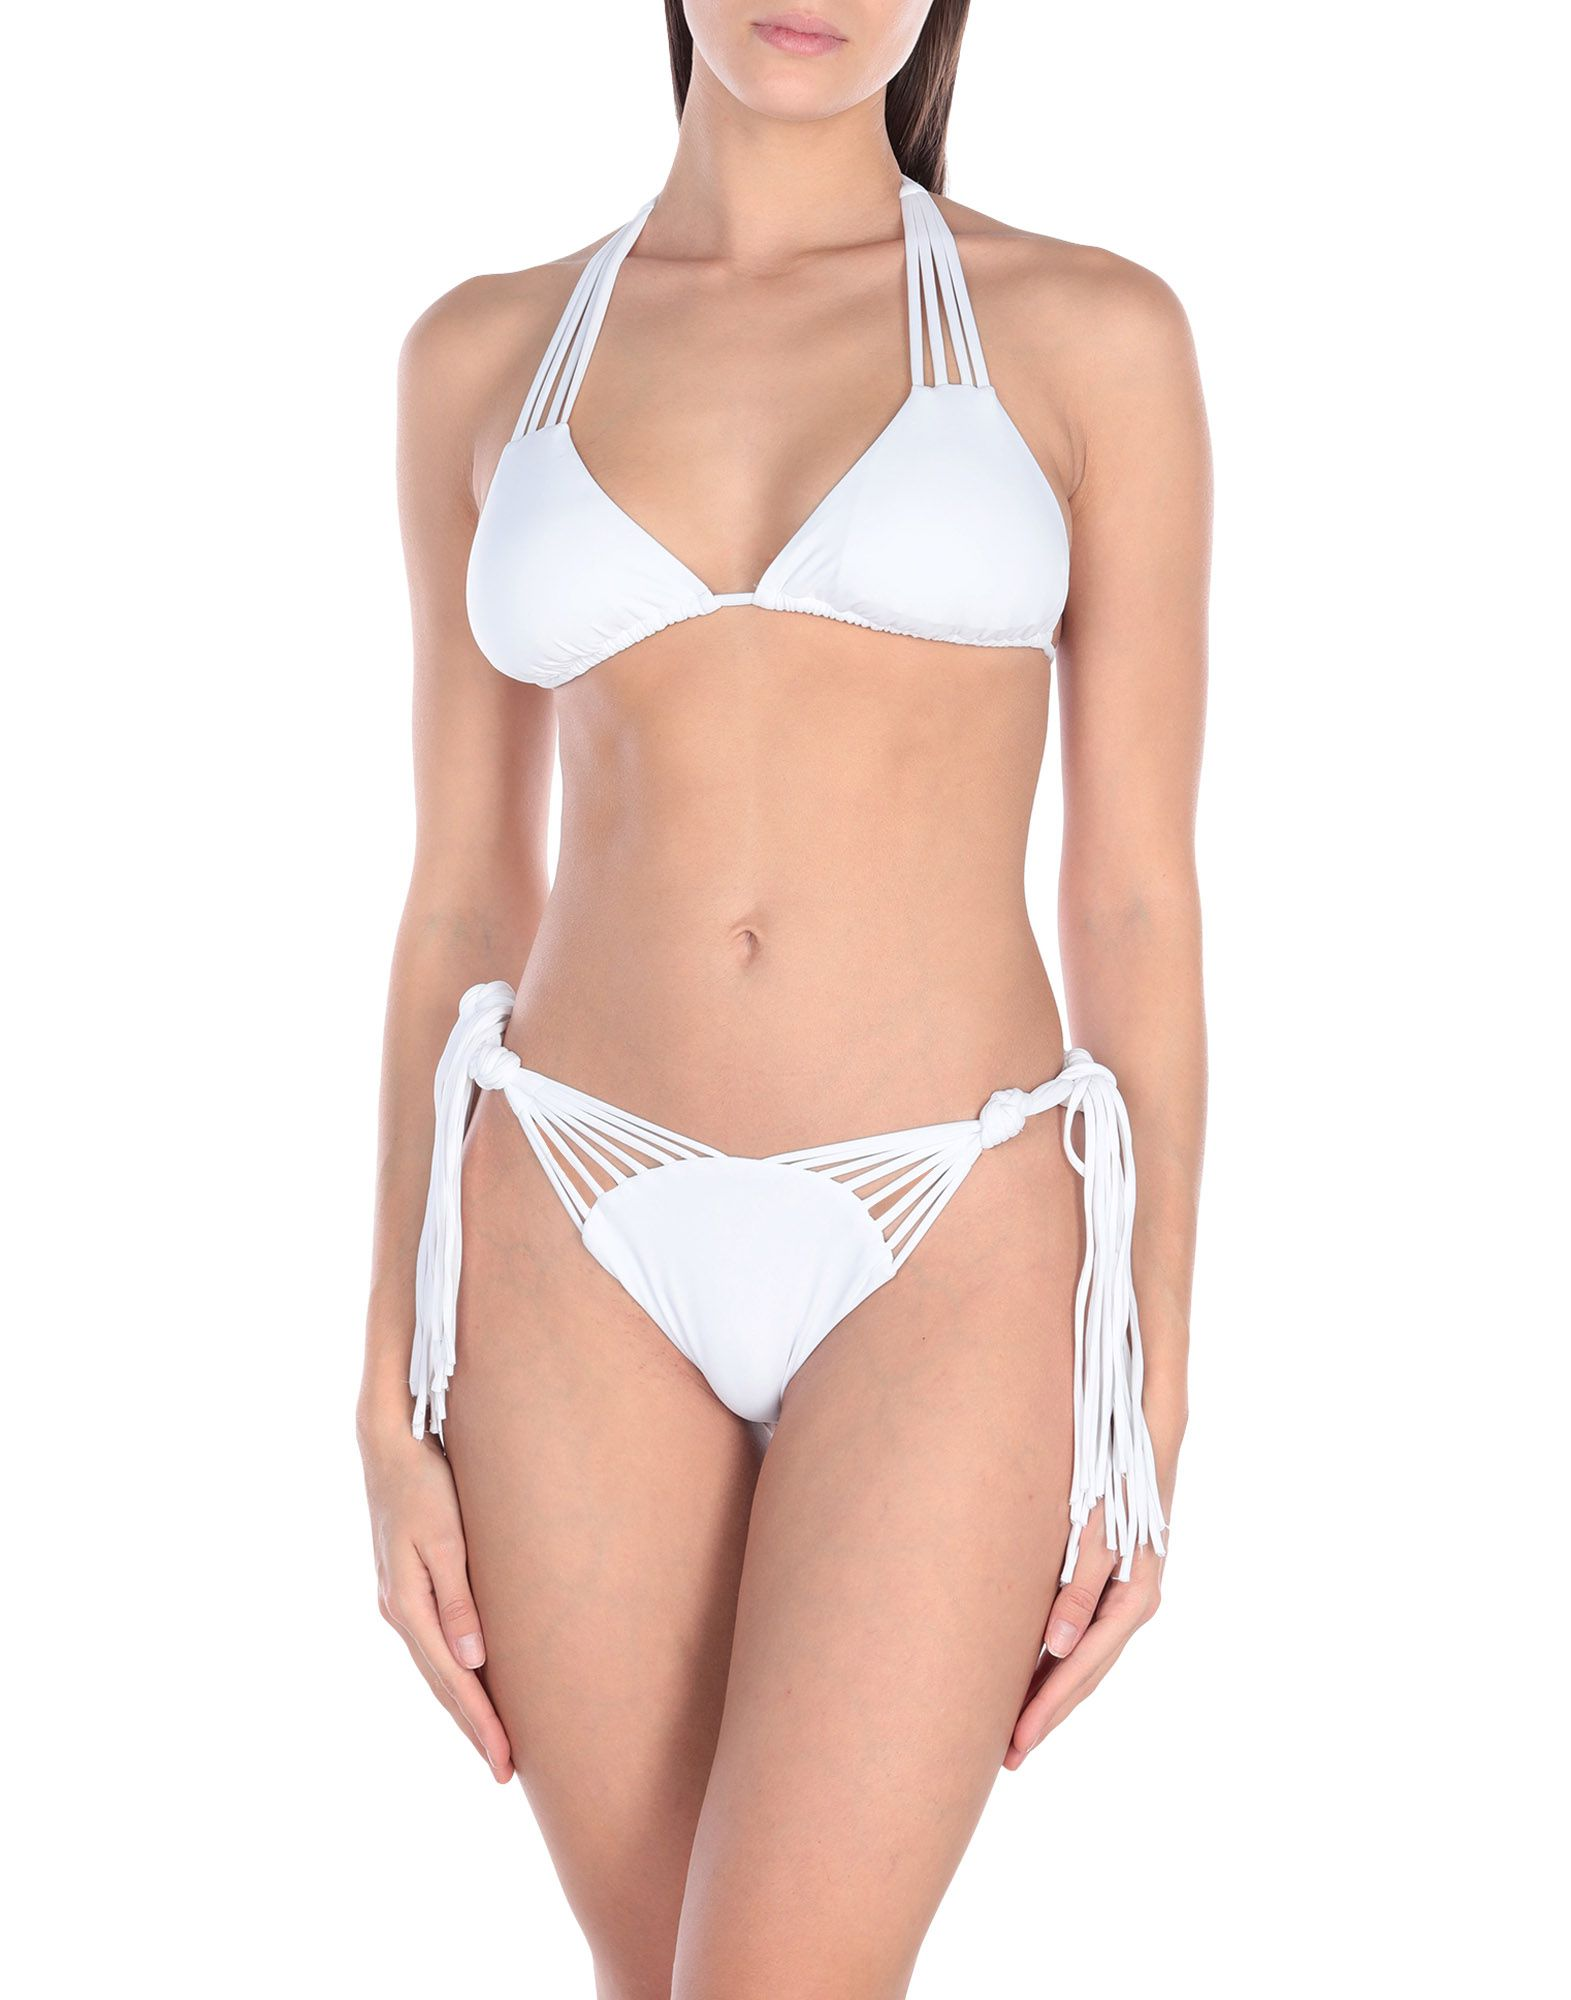 MISS BIKINI LUXE Бикини white stitching random geometrical print bikini set